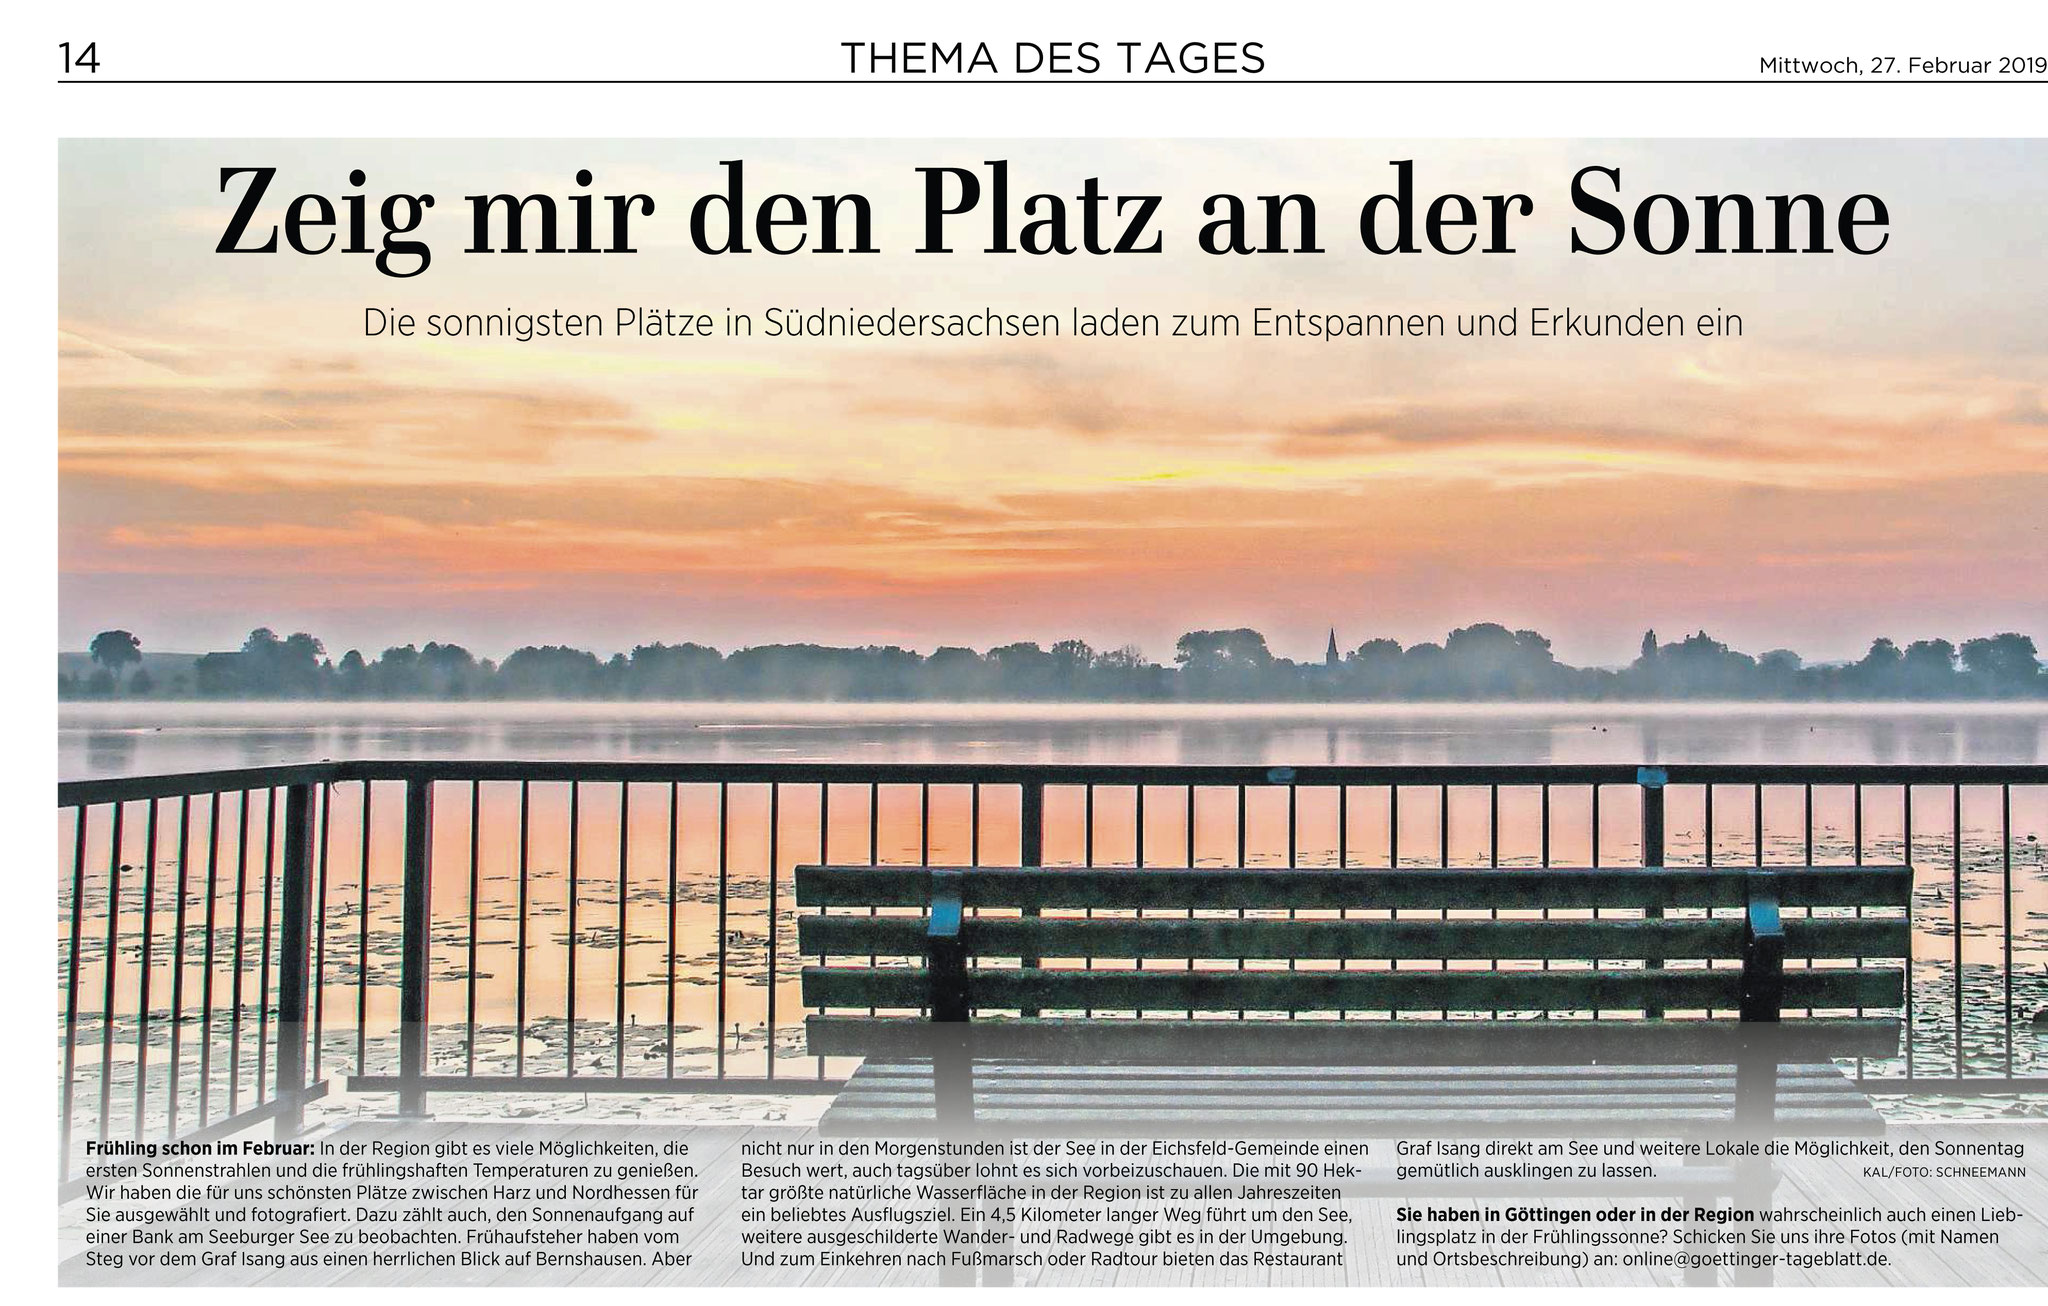 Thema des Tages Göttinger Tageblatt / Eichsfelder Tageblatt: Sonnenaufgang am Seeburger See